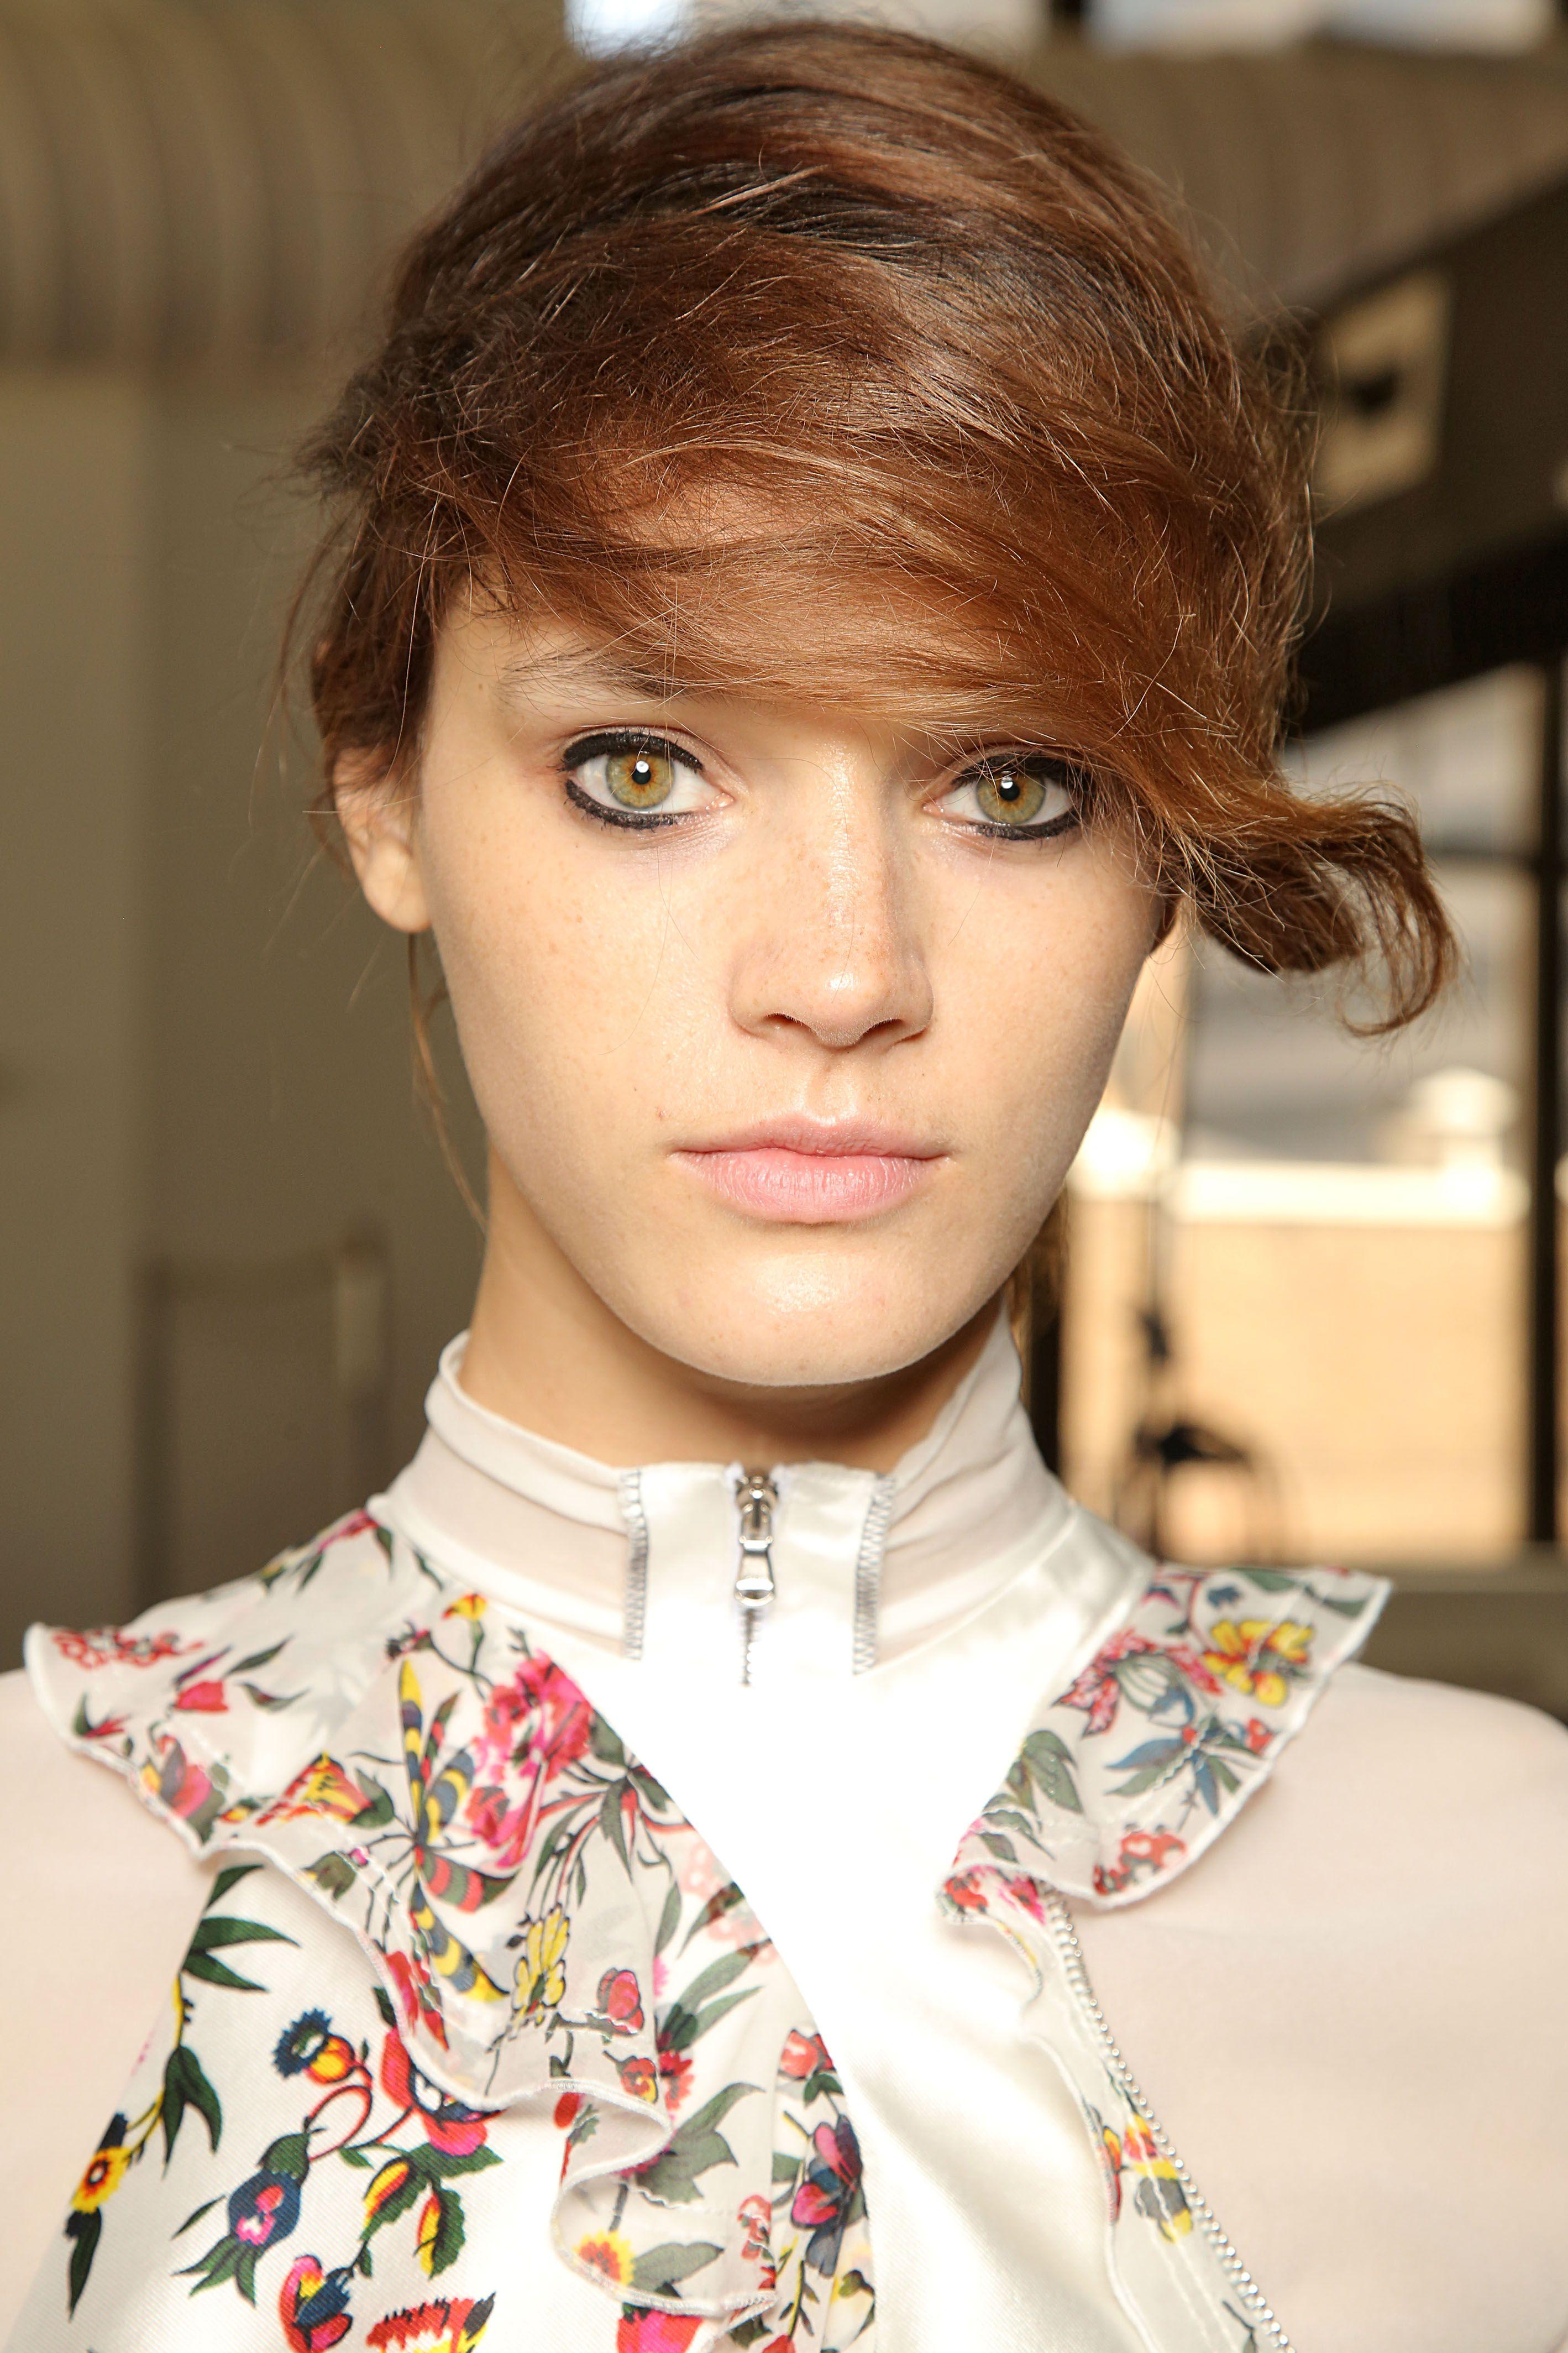 New Eyeliner Trends - Ways To Wear Eyeliner